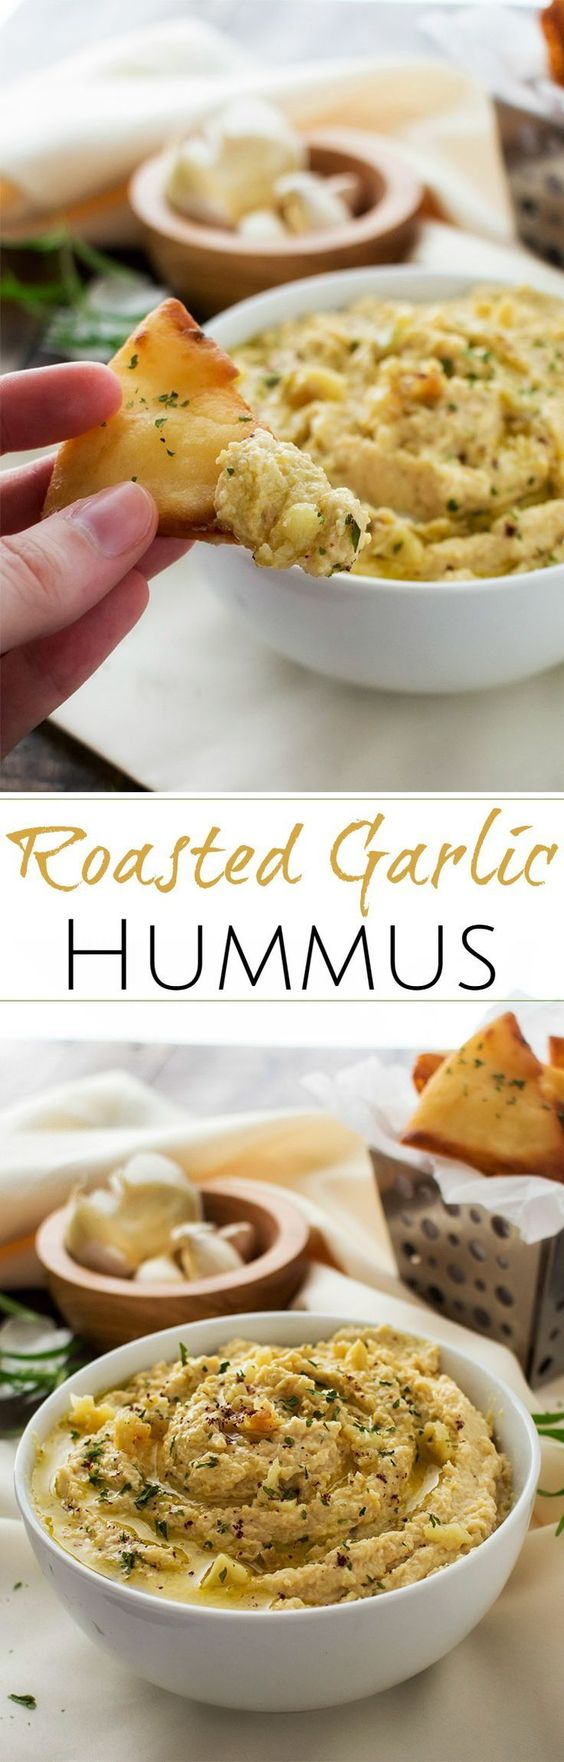 Roasted Garlic Hummus | The Chunky Chef | Creamy, rich hummus with a ...